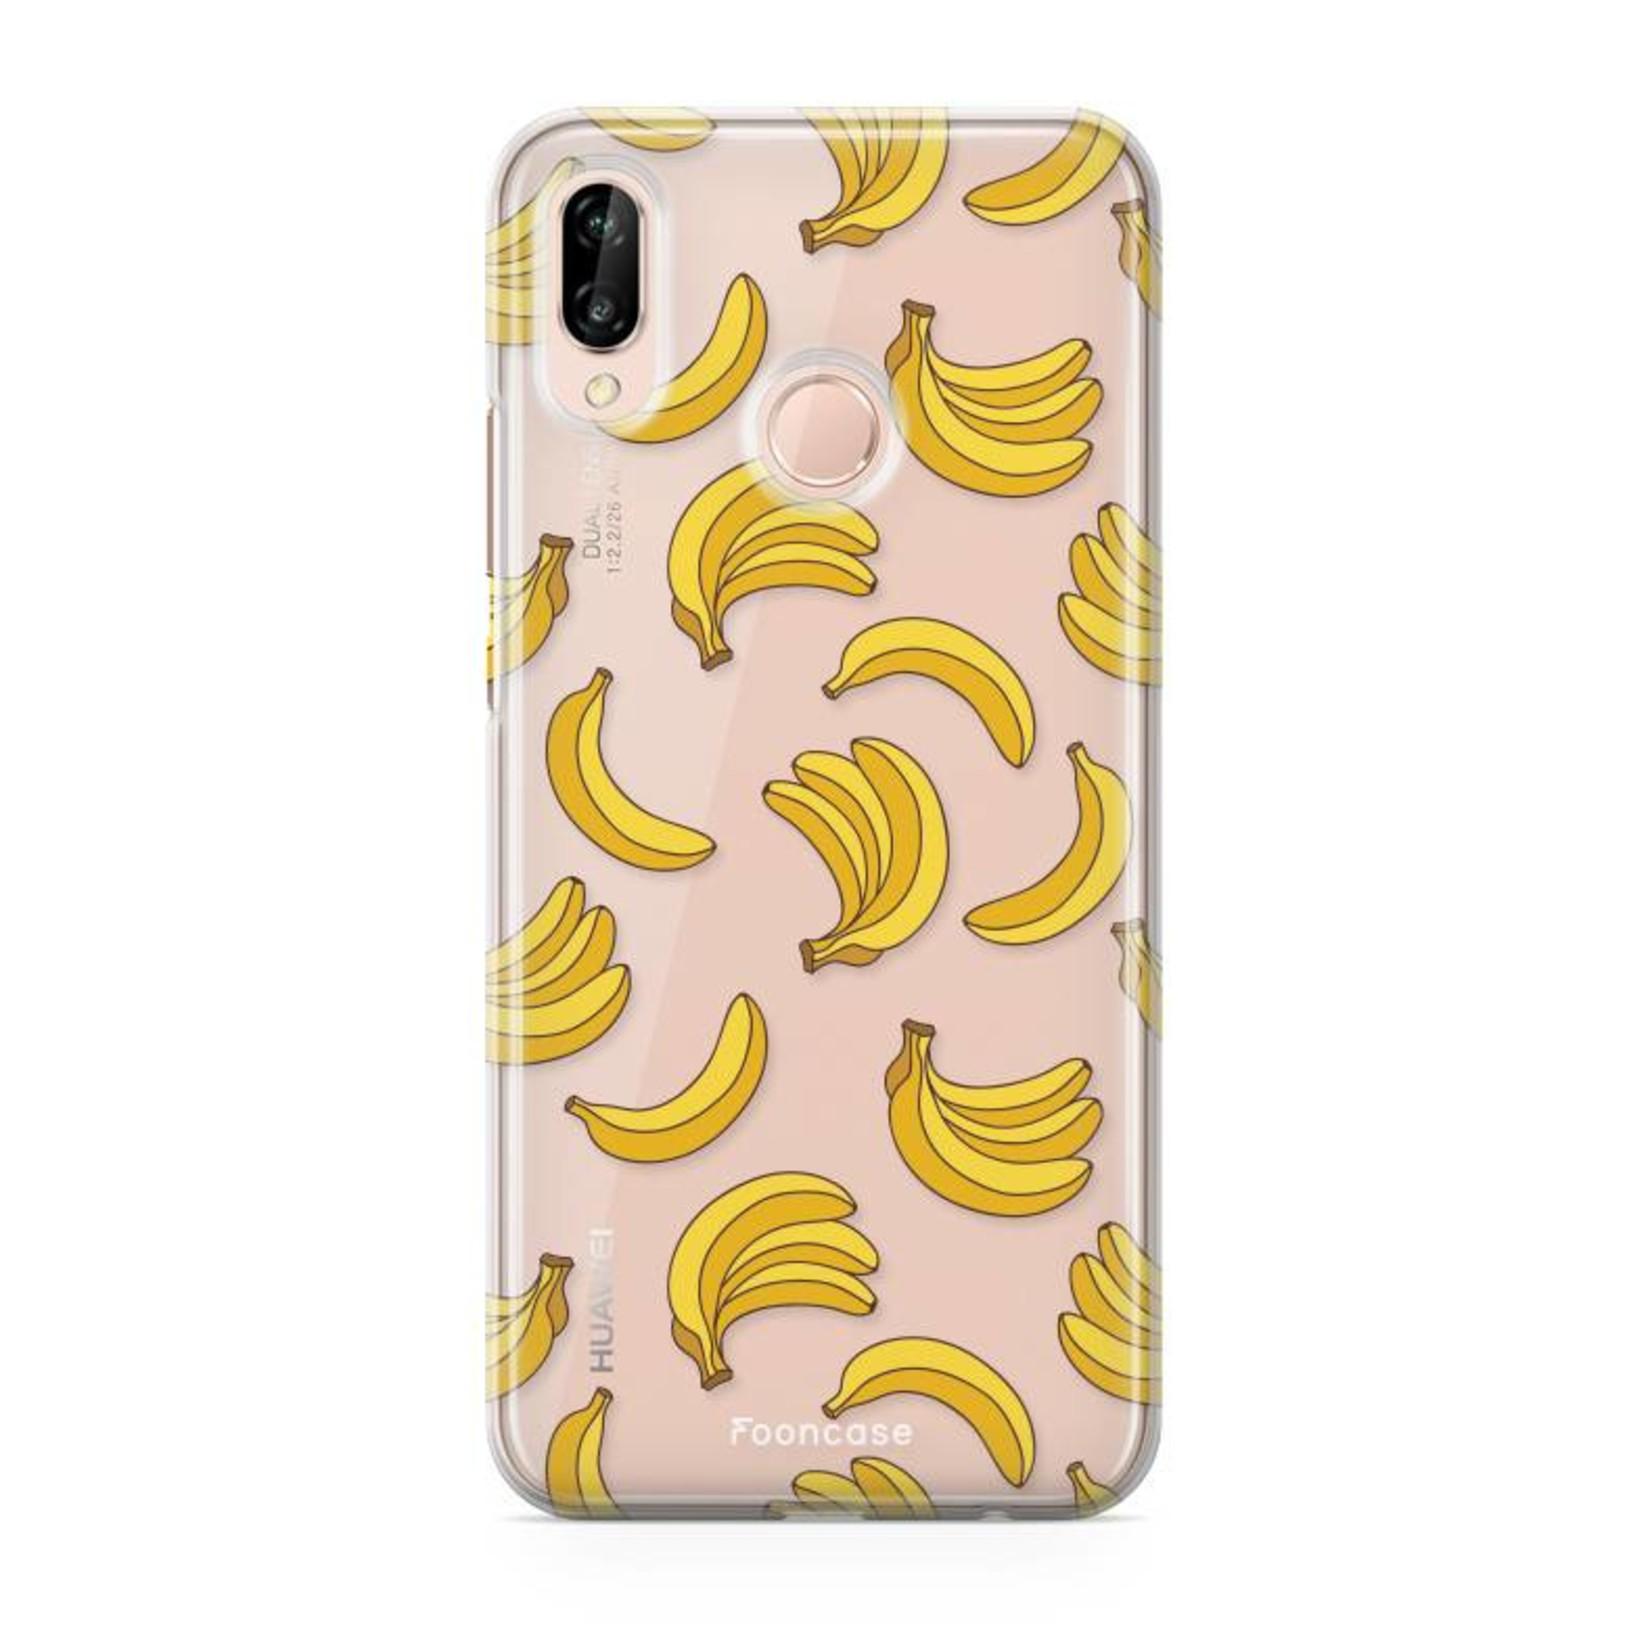 FOONCASE Huawei P20 Lite - Bananas